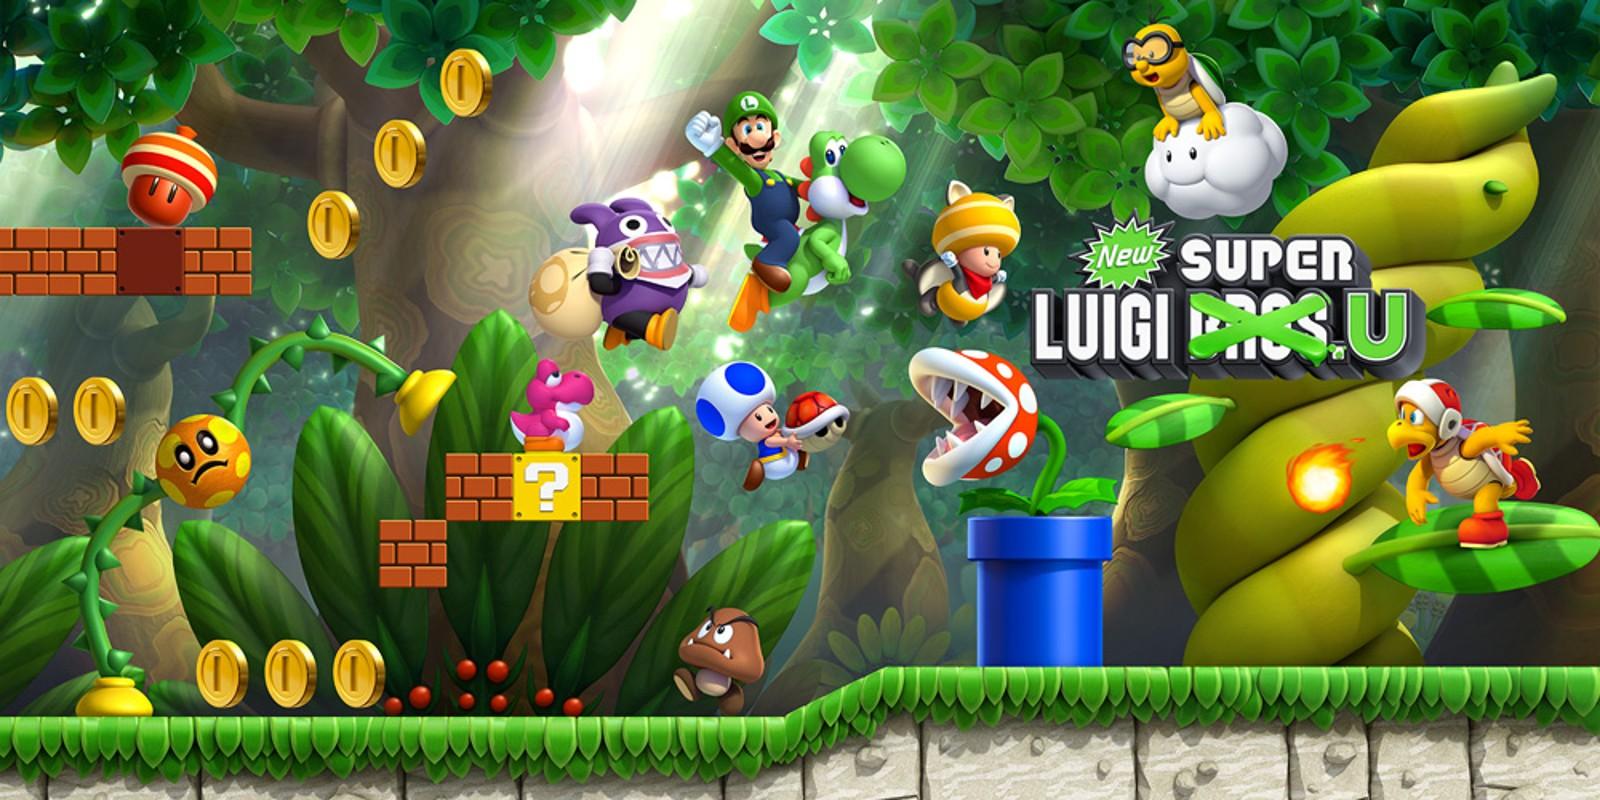 New Super Luigi U Wii U Spiele Nintendo